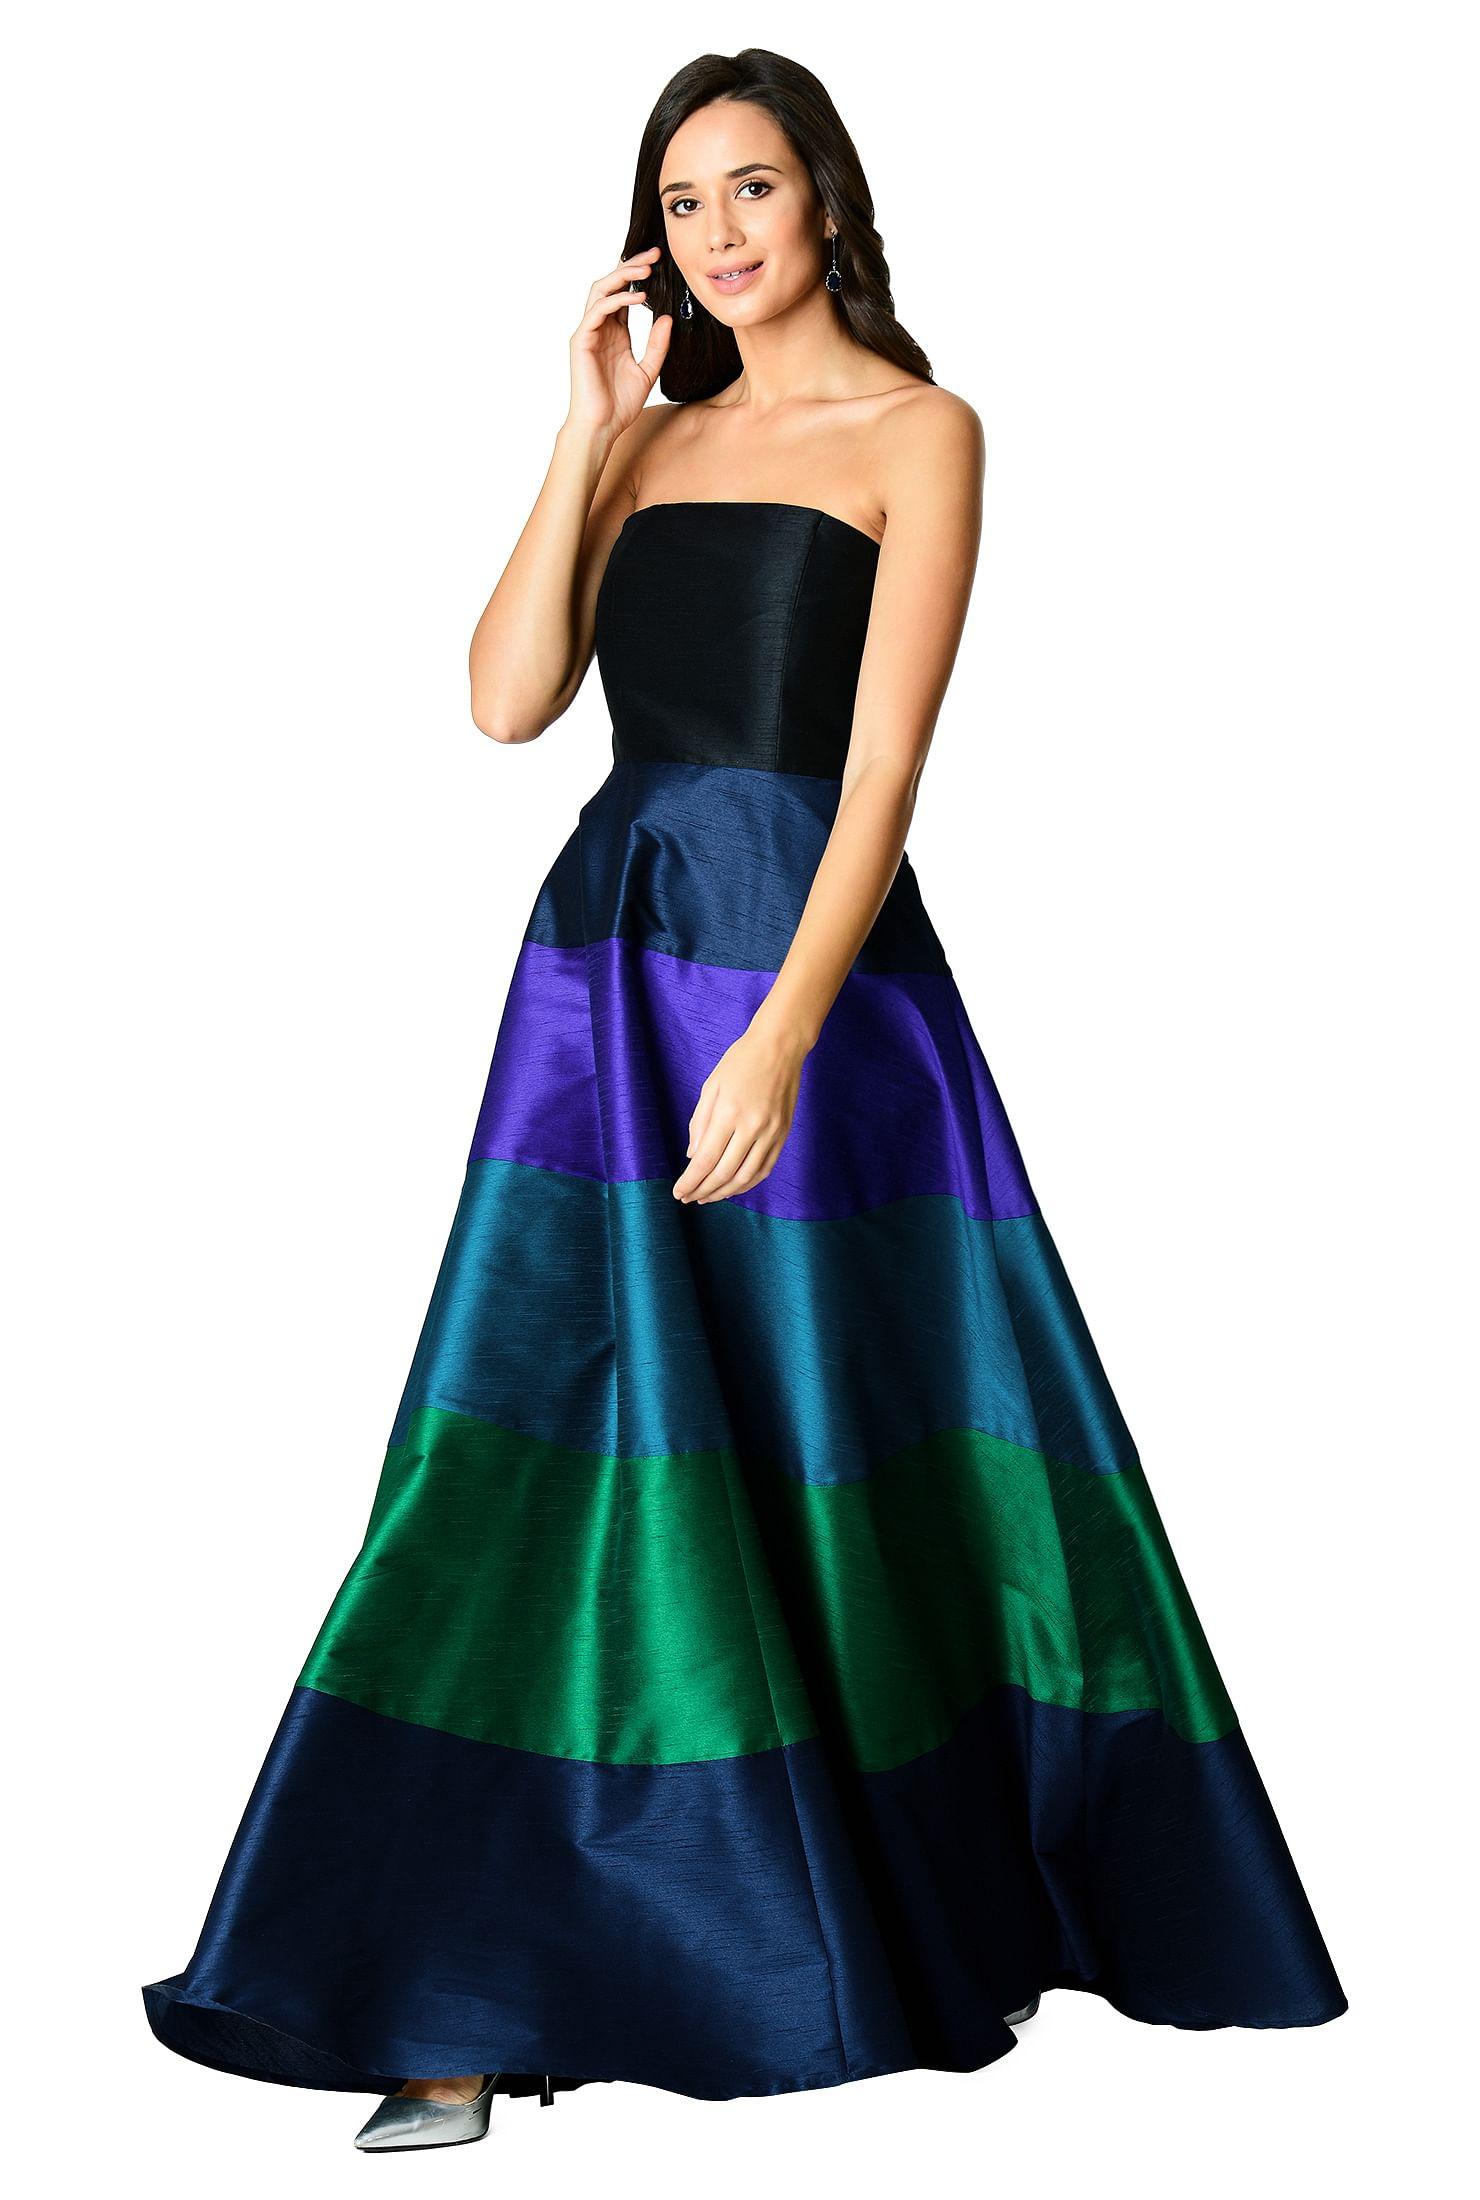 a3bf163e4e66 black/navy/green multi dresses, Colorblock Dresses, feminine dresses, Full